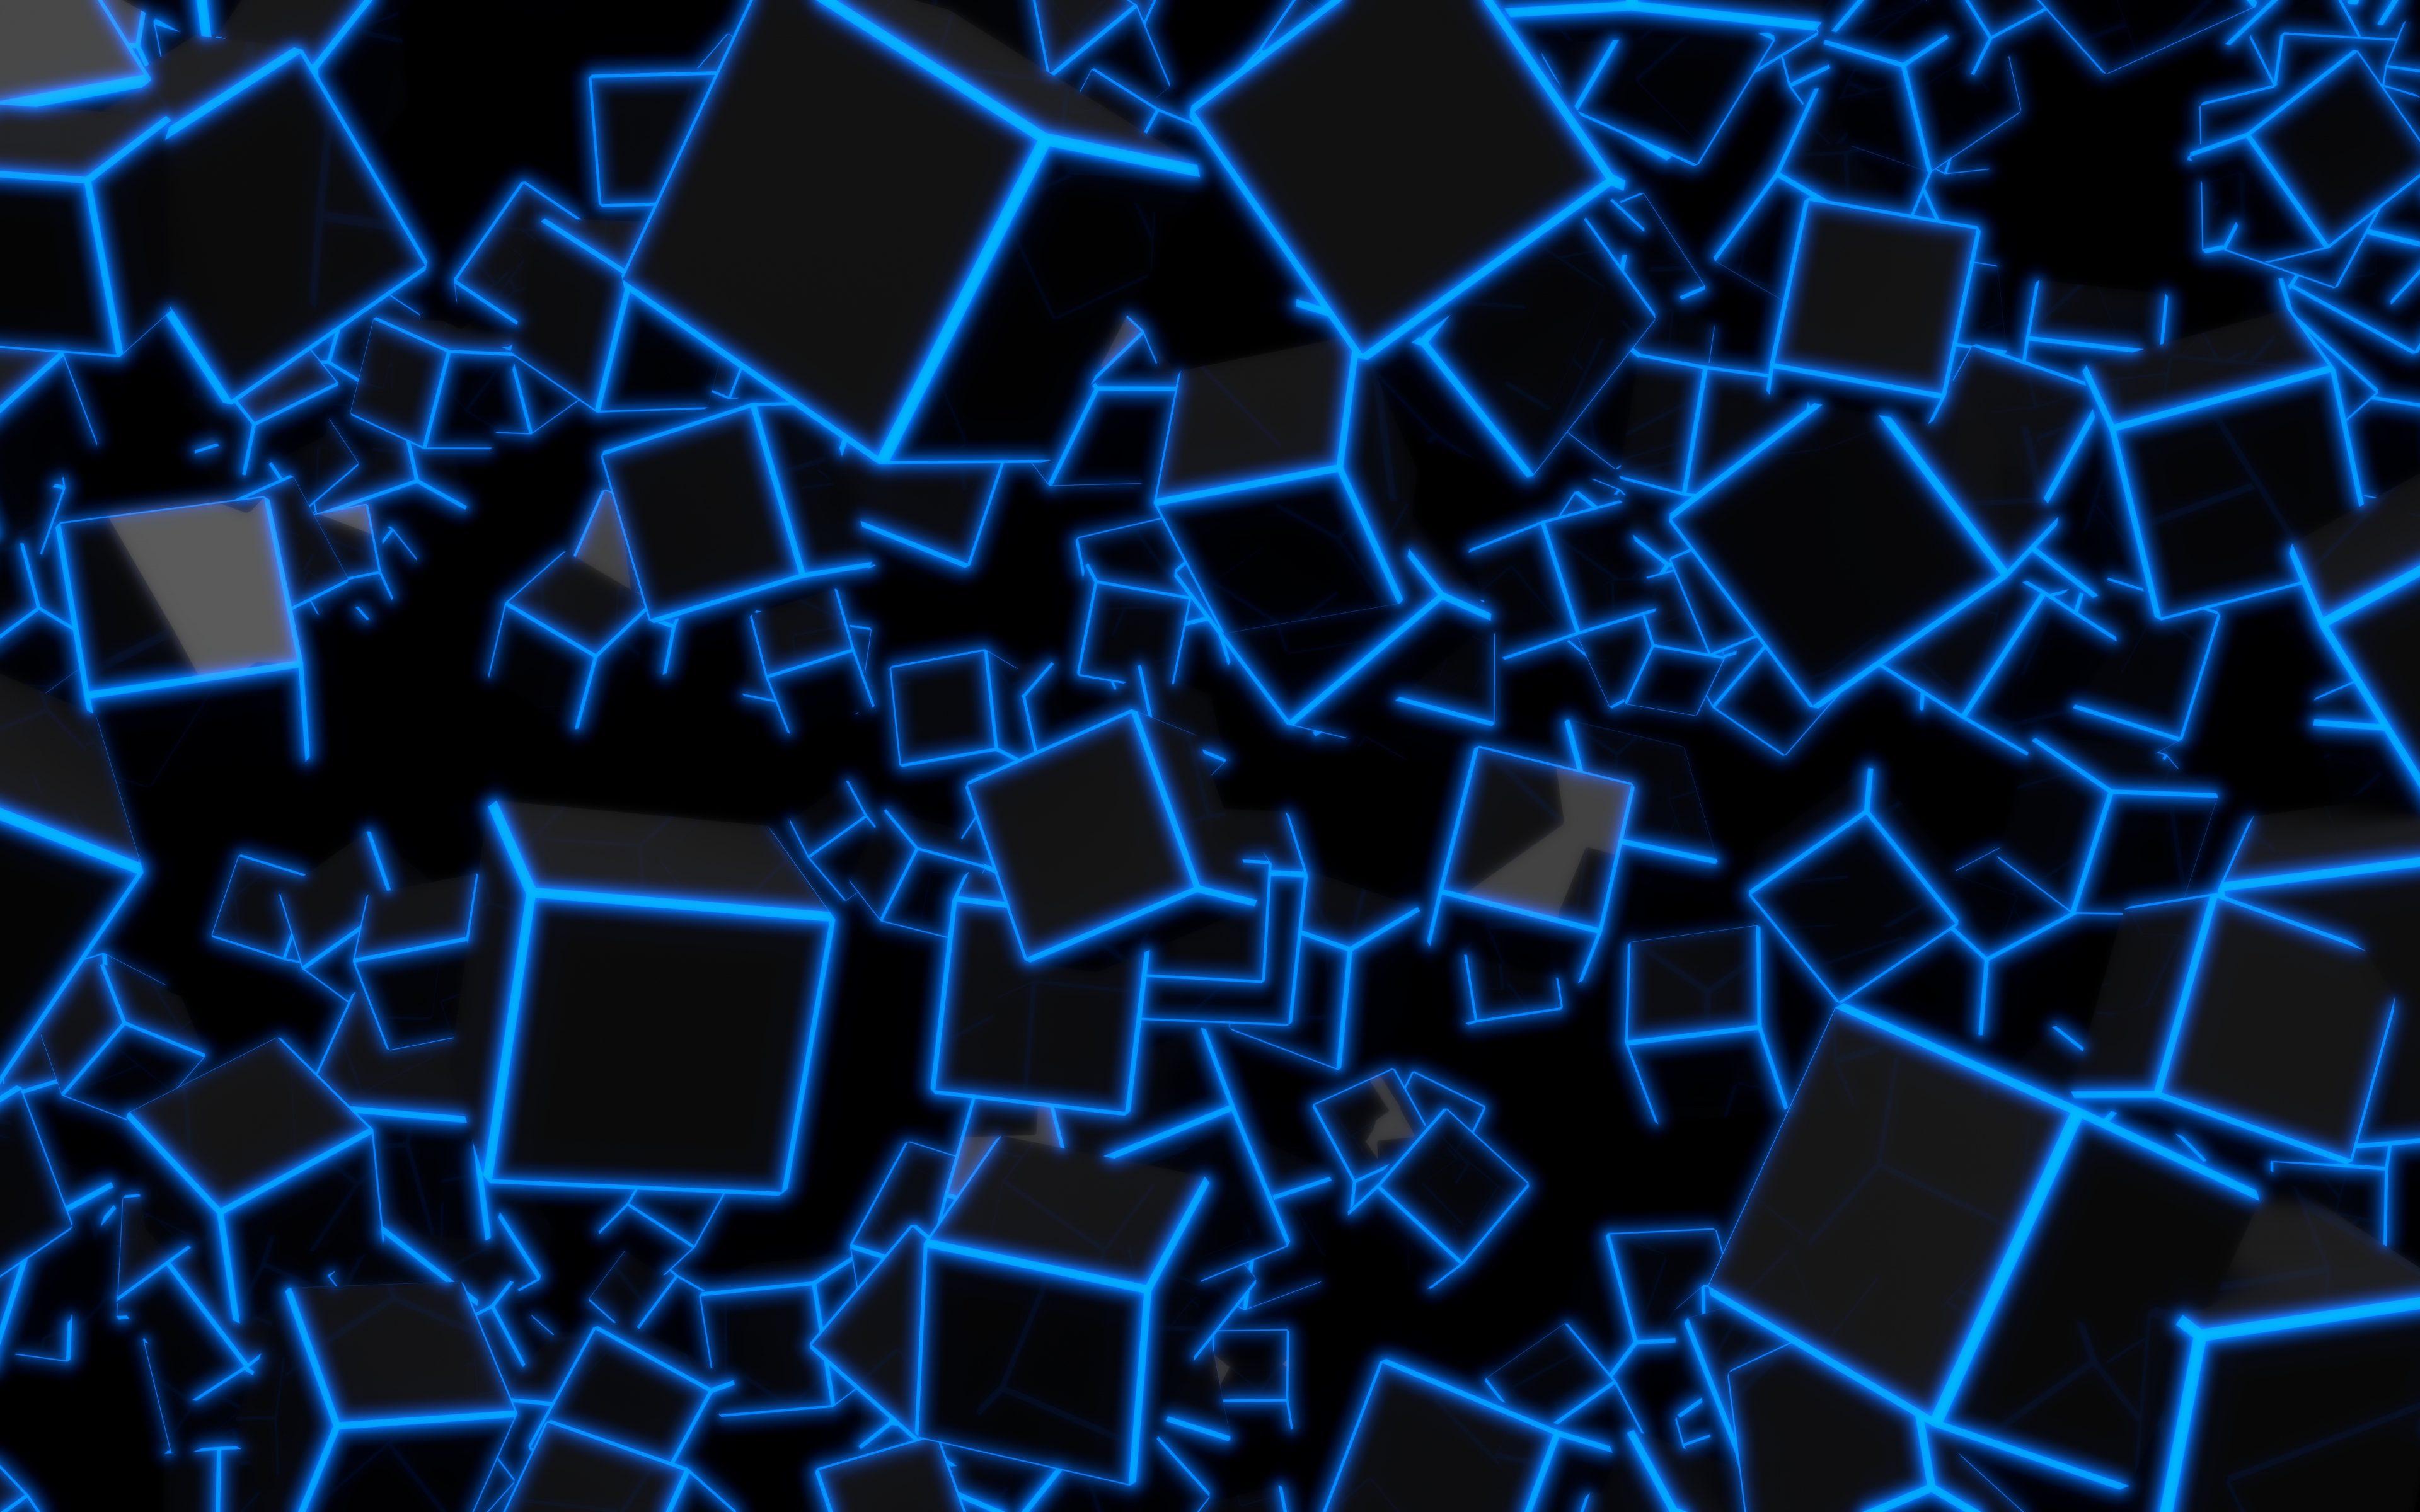 Black And Blue Wallpaper 4k